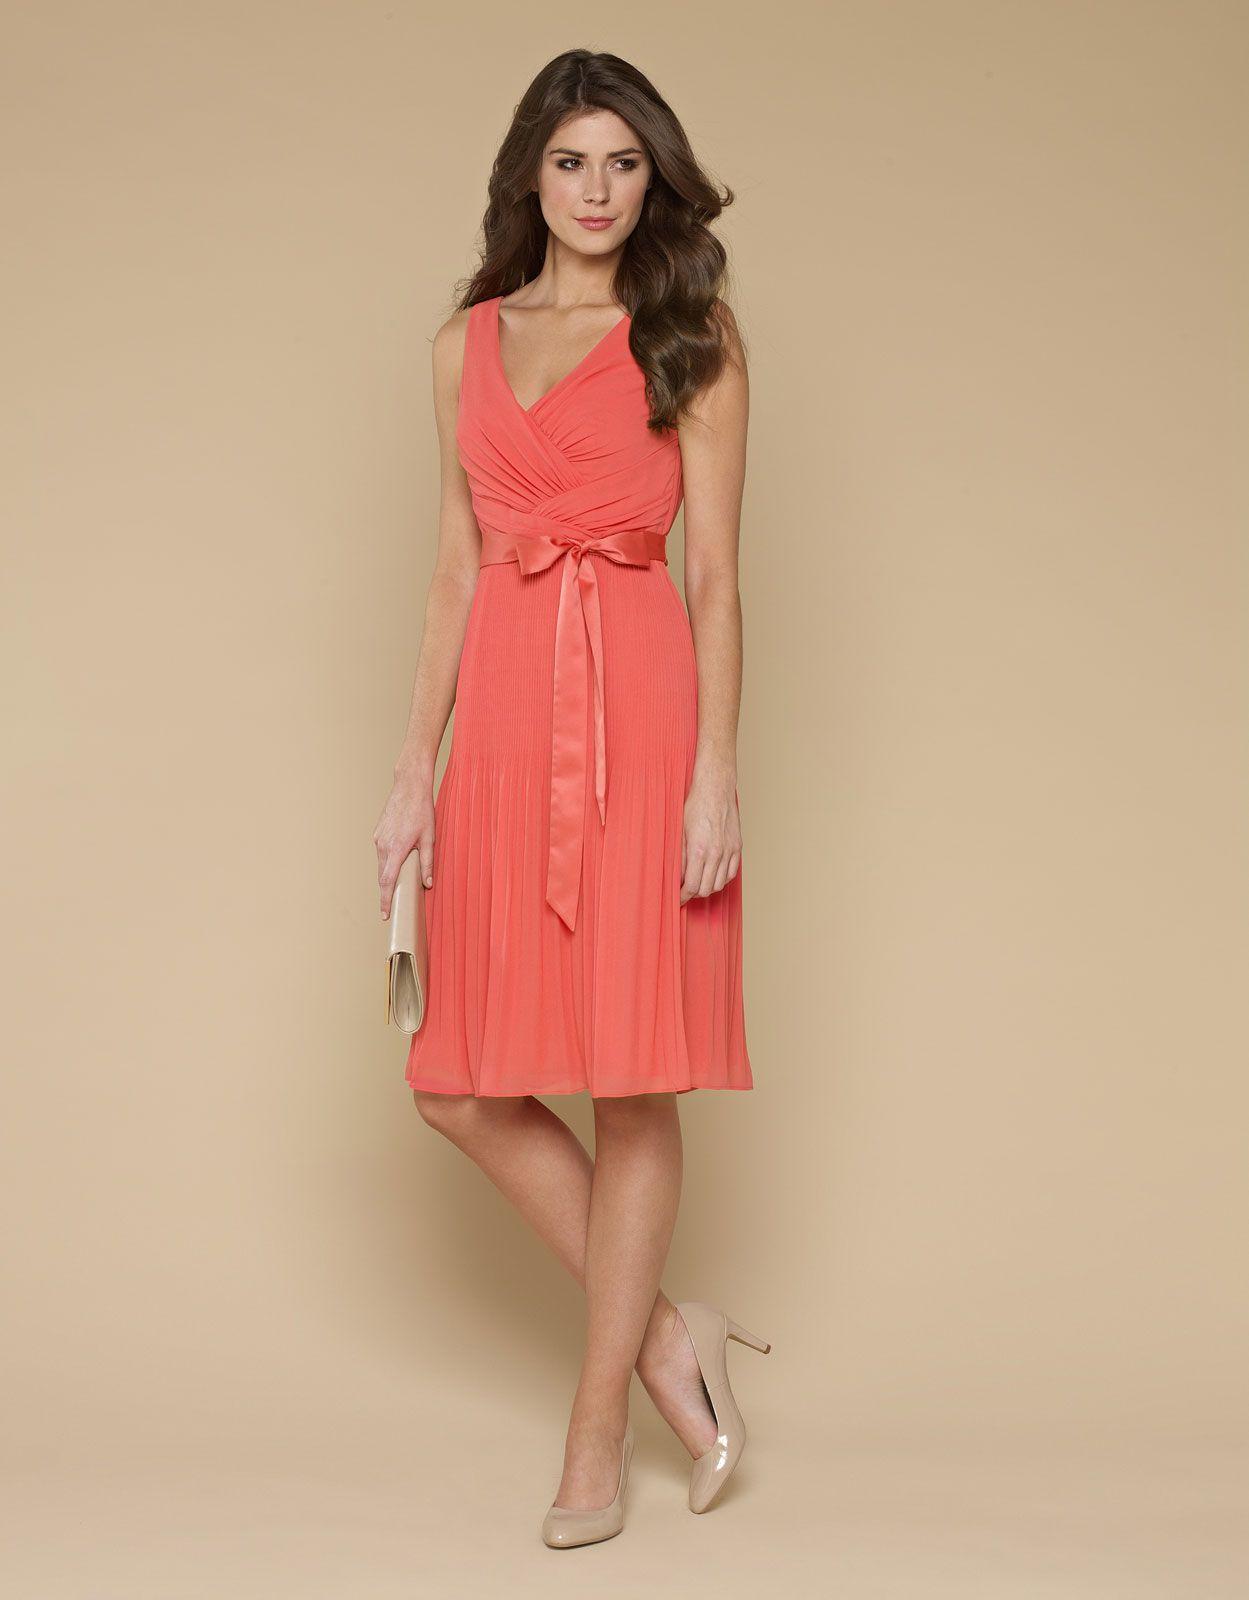 eb7a0f2ec33a Ville Coral Pleat Dress | Clothes | Coral dress wedding, Monsoon ...